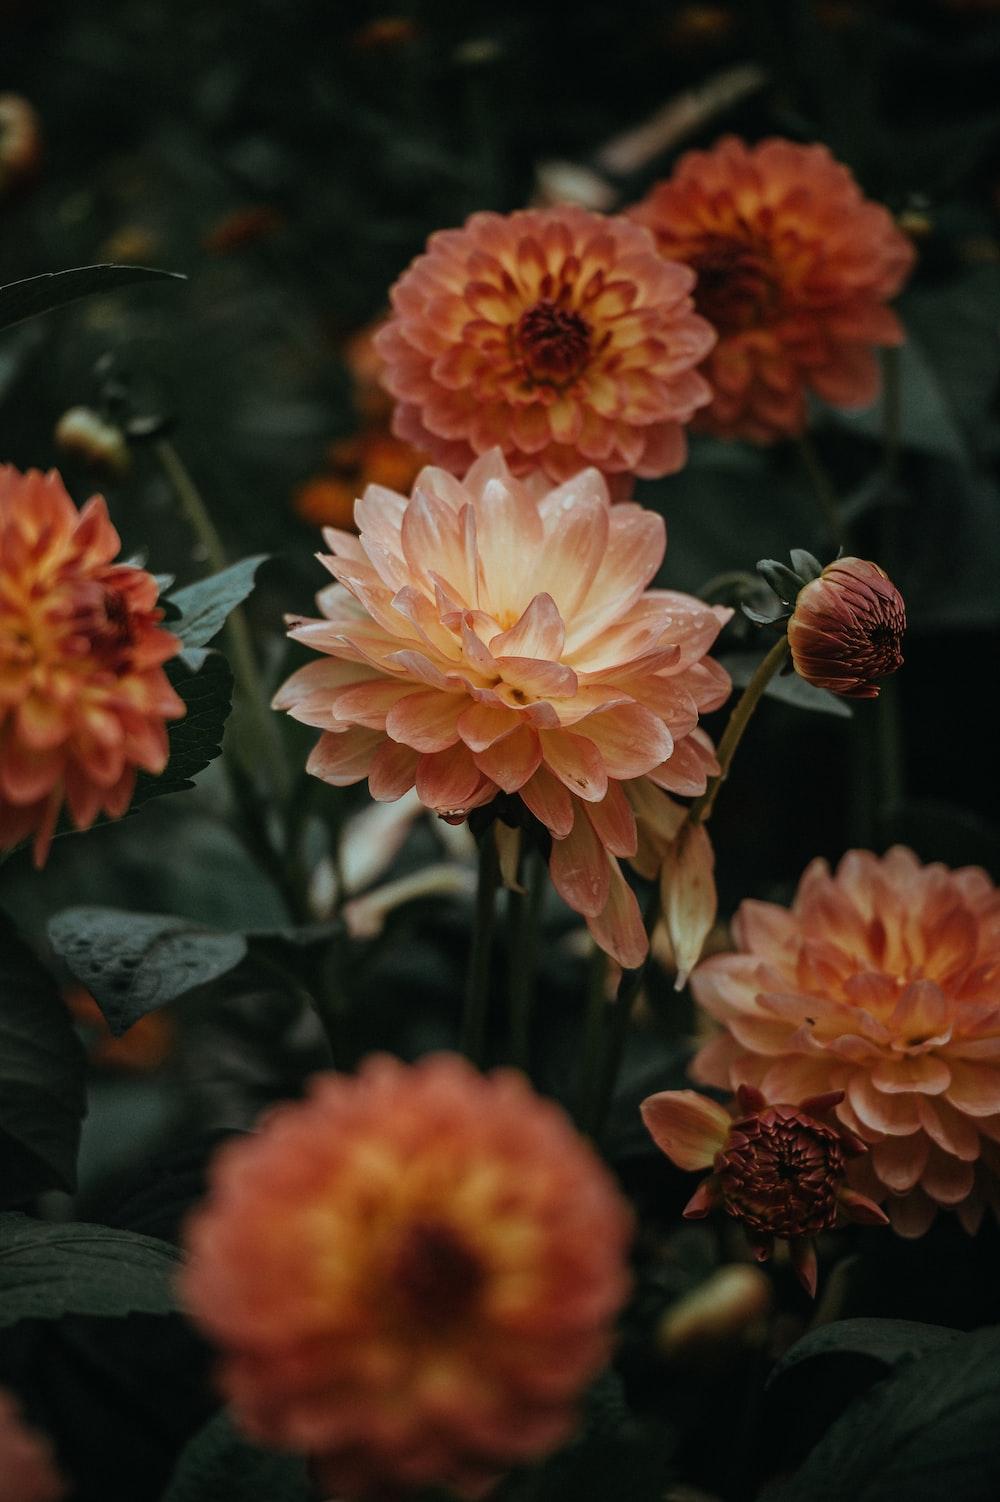 Dahlia photo by annie spratt anniespratt on unsplash orange dahlia flowers closeup photo izmirmasajfo